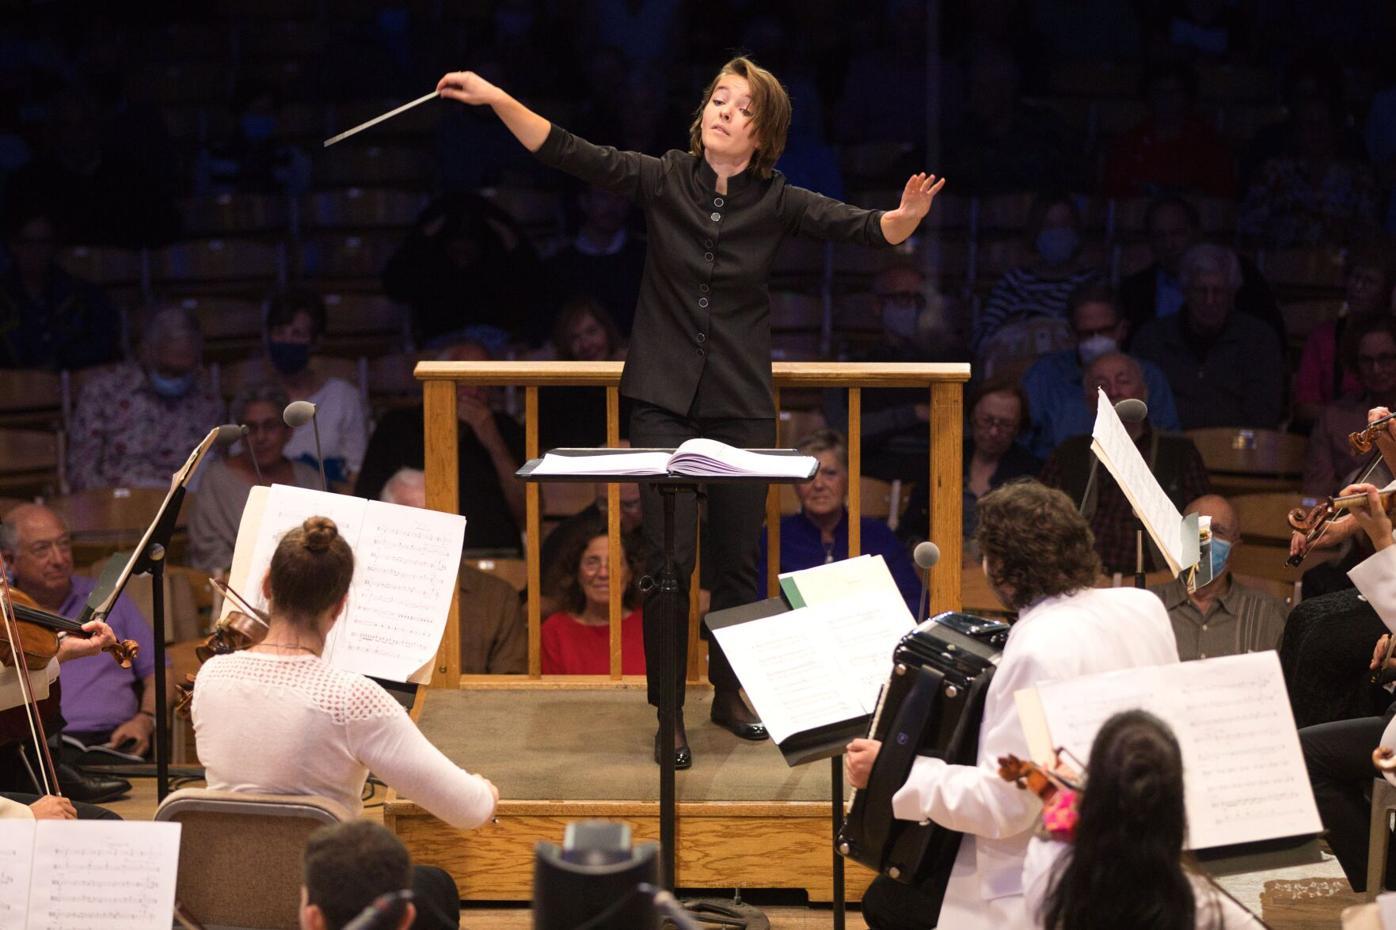 BSO Assistant Conductor Anna Rakitina